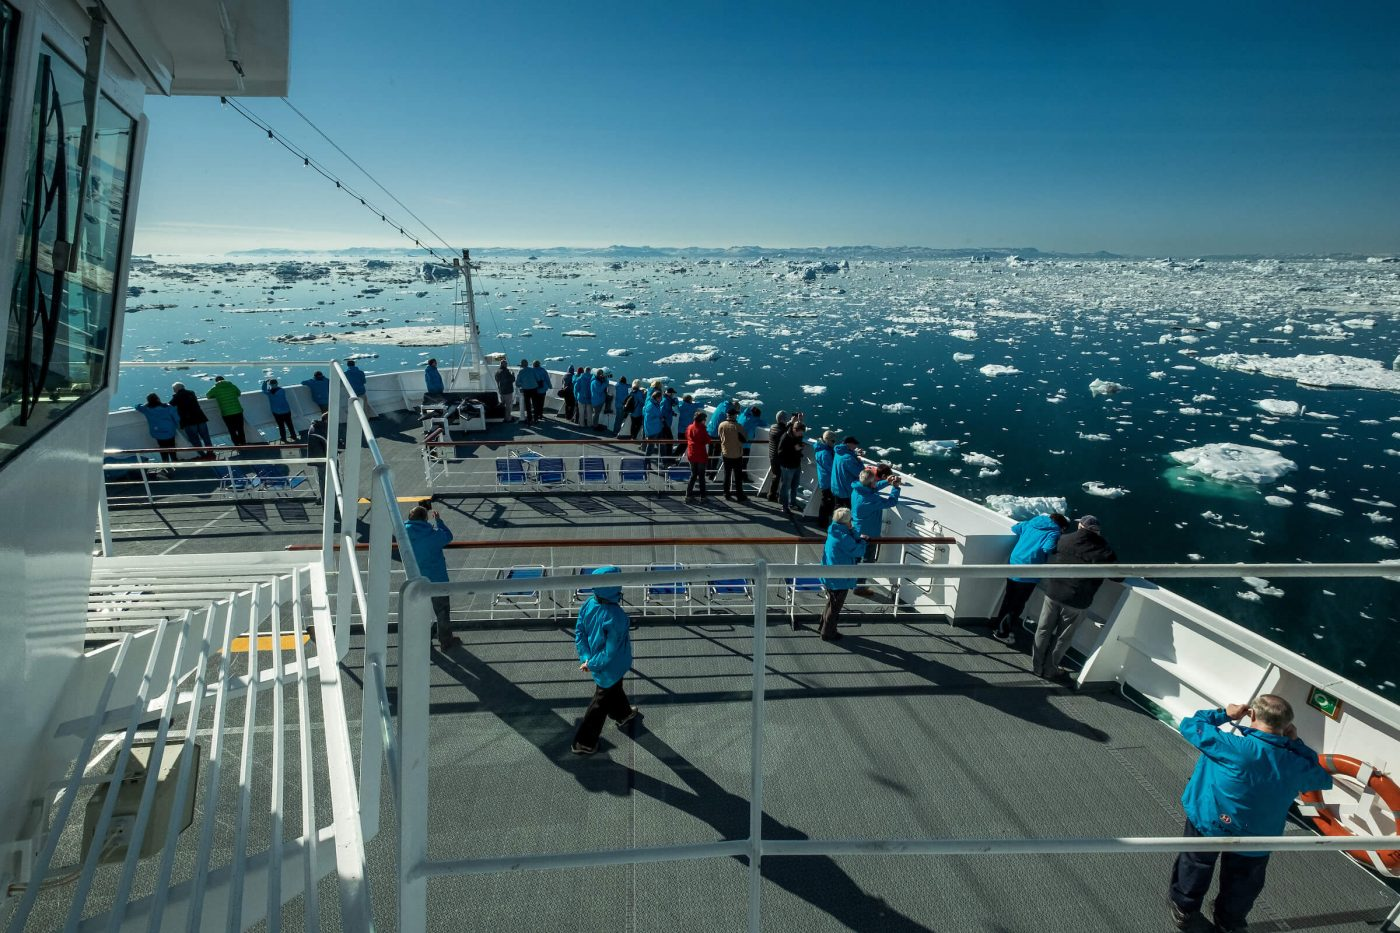 MS Fram from Hurtigruten going through a field of icebergs near Ilulissat in Greenland